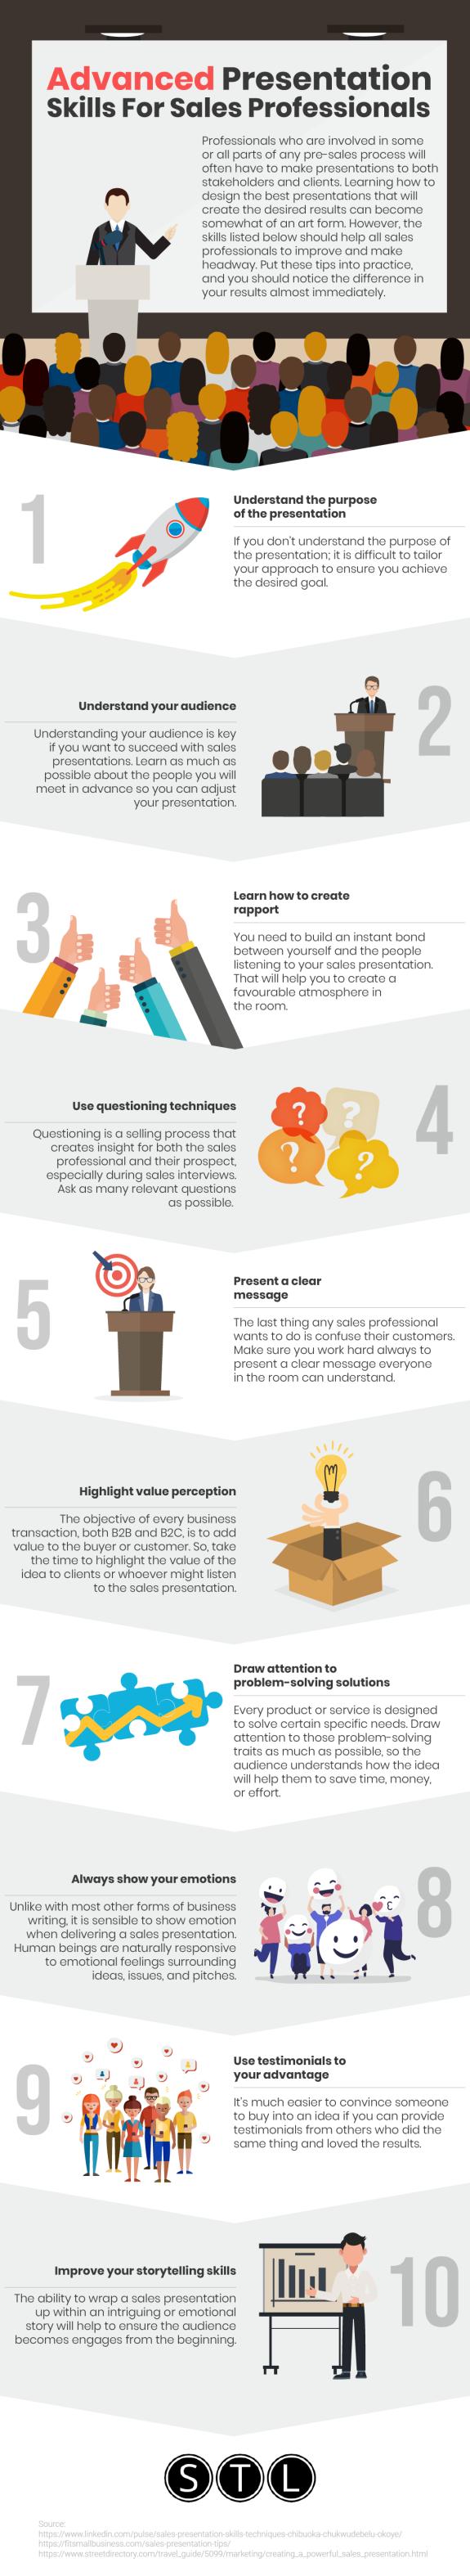 Advanced Presentation Skills for Sales Professionals